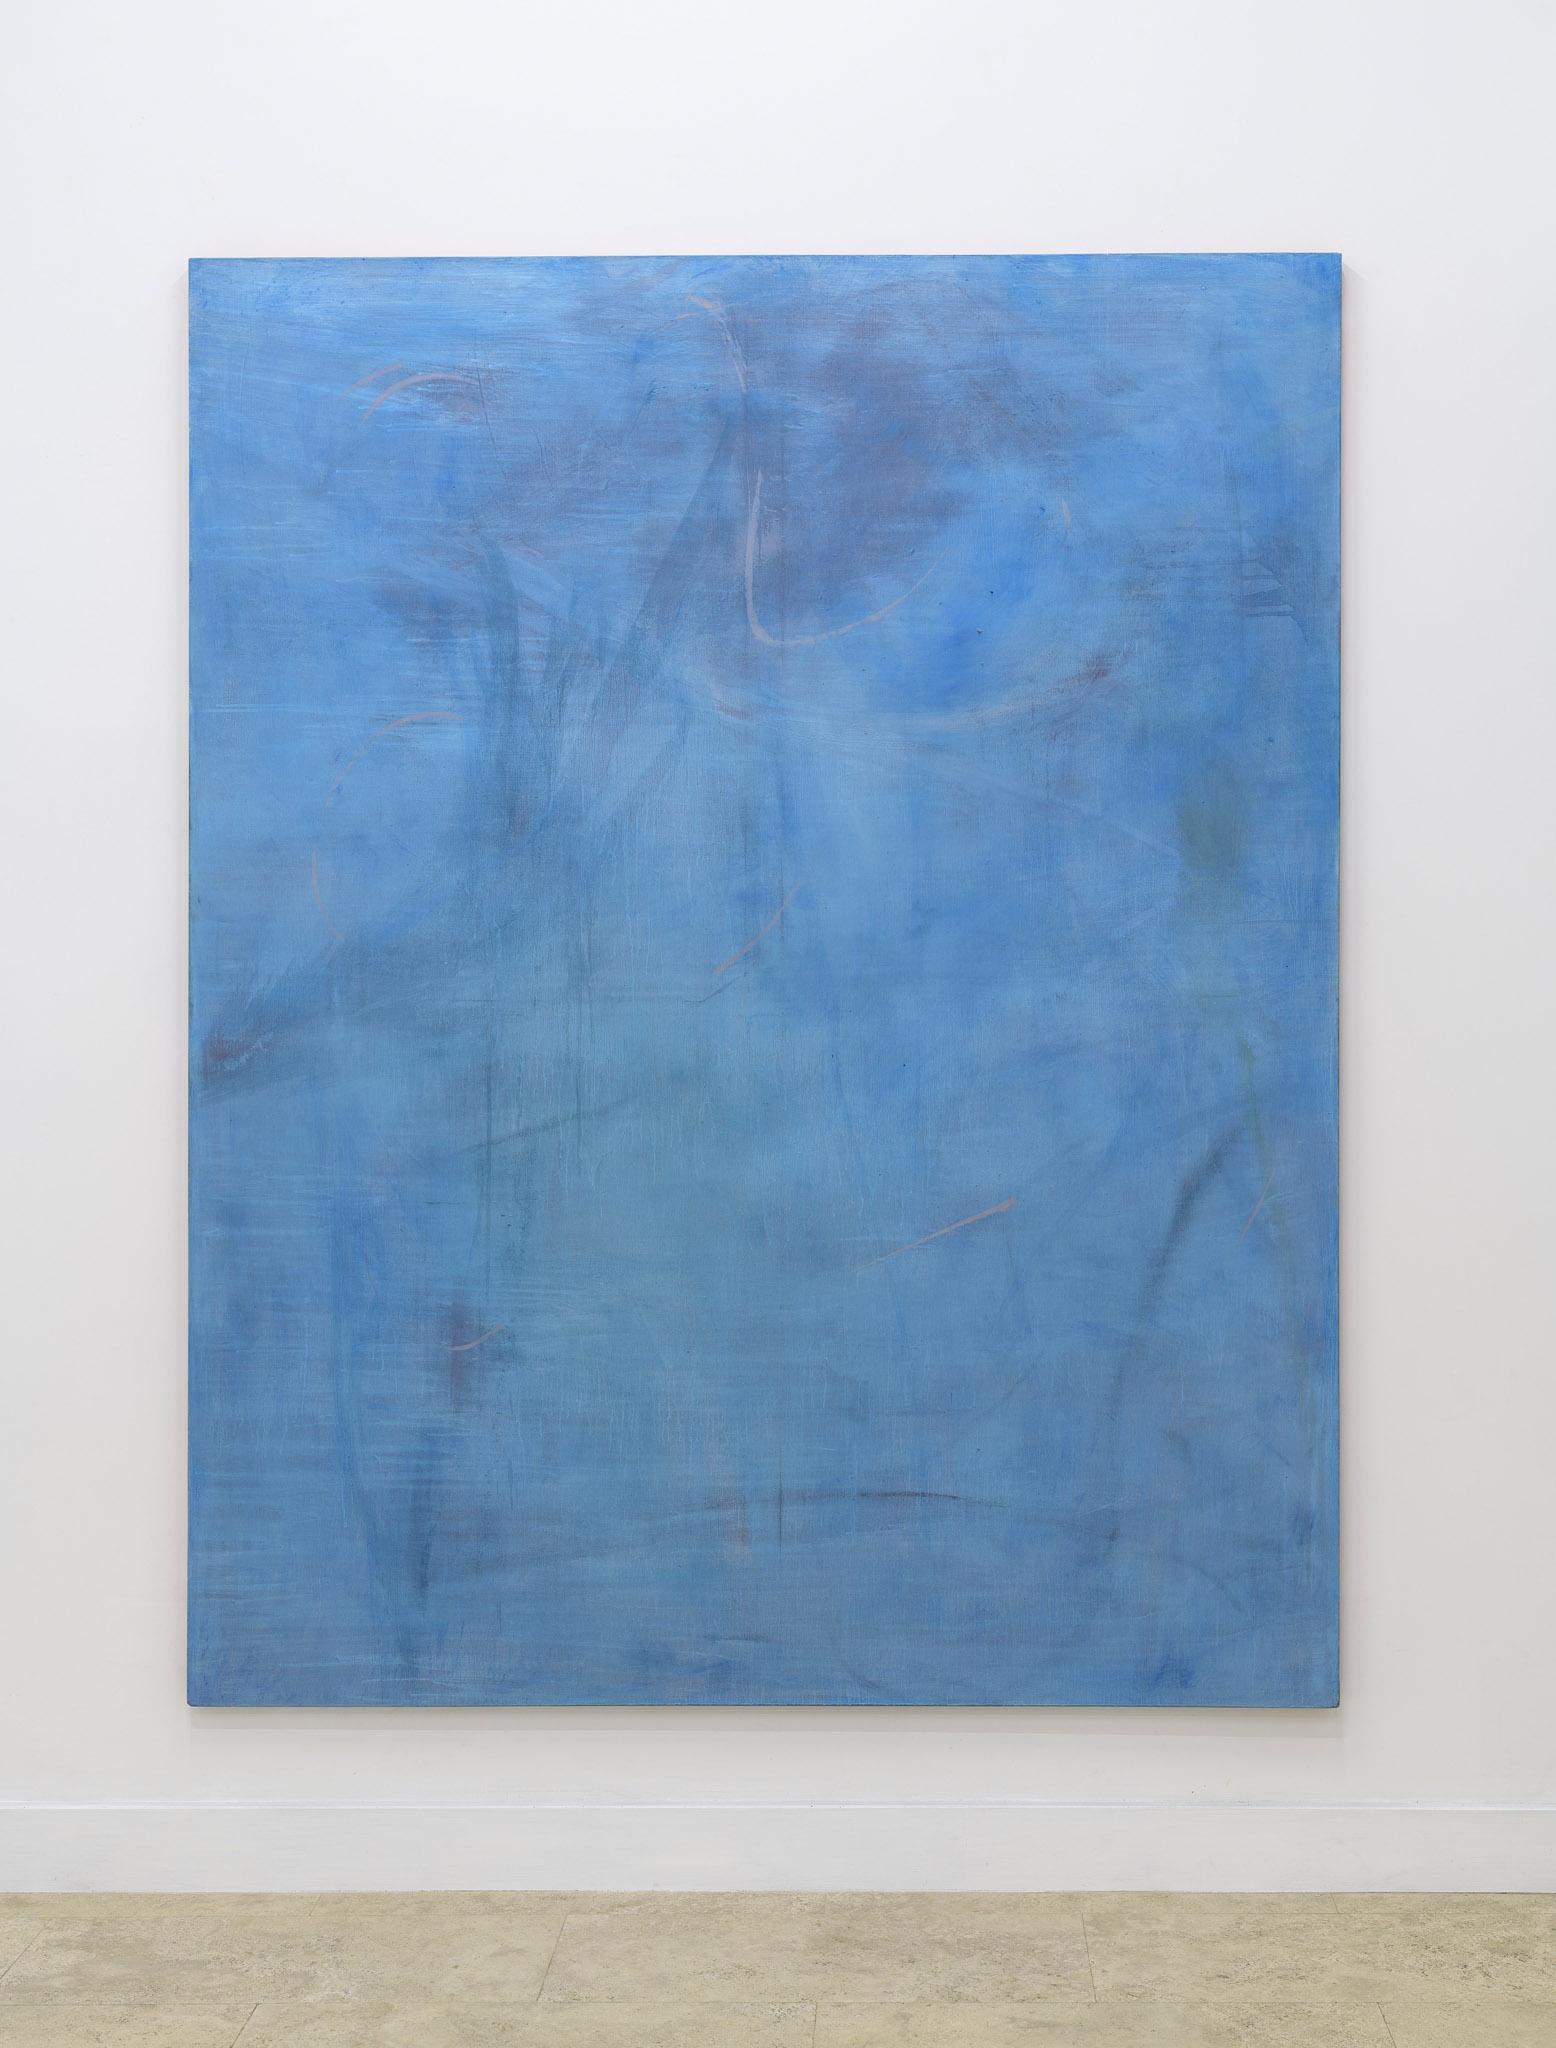 Richter Fine Art, Luca Grechi, Un blu sopra le cose, mixed media on canvas, 190x150cm, 2019